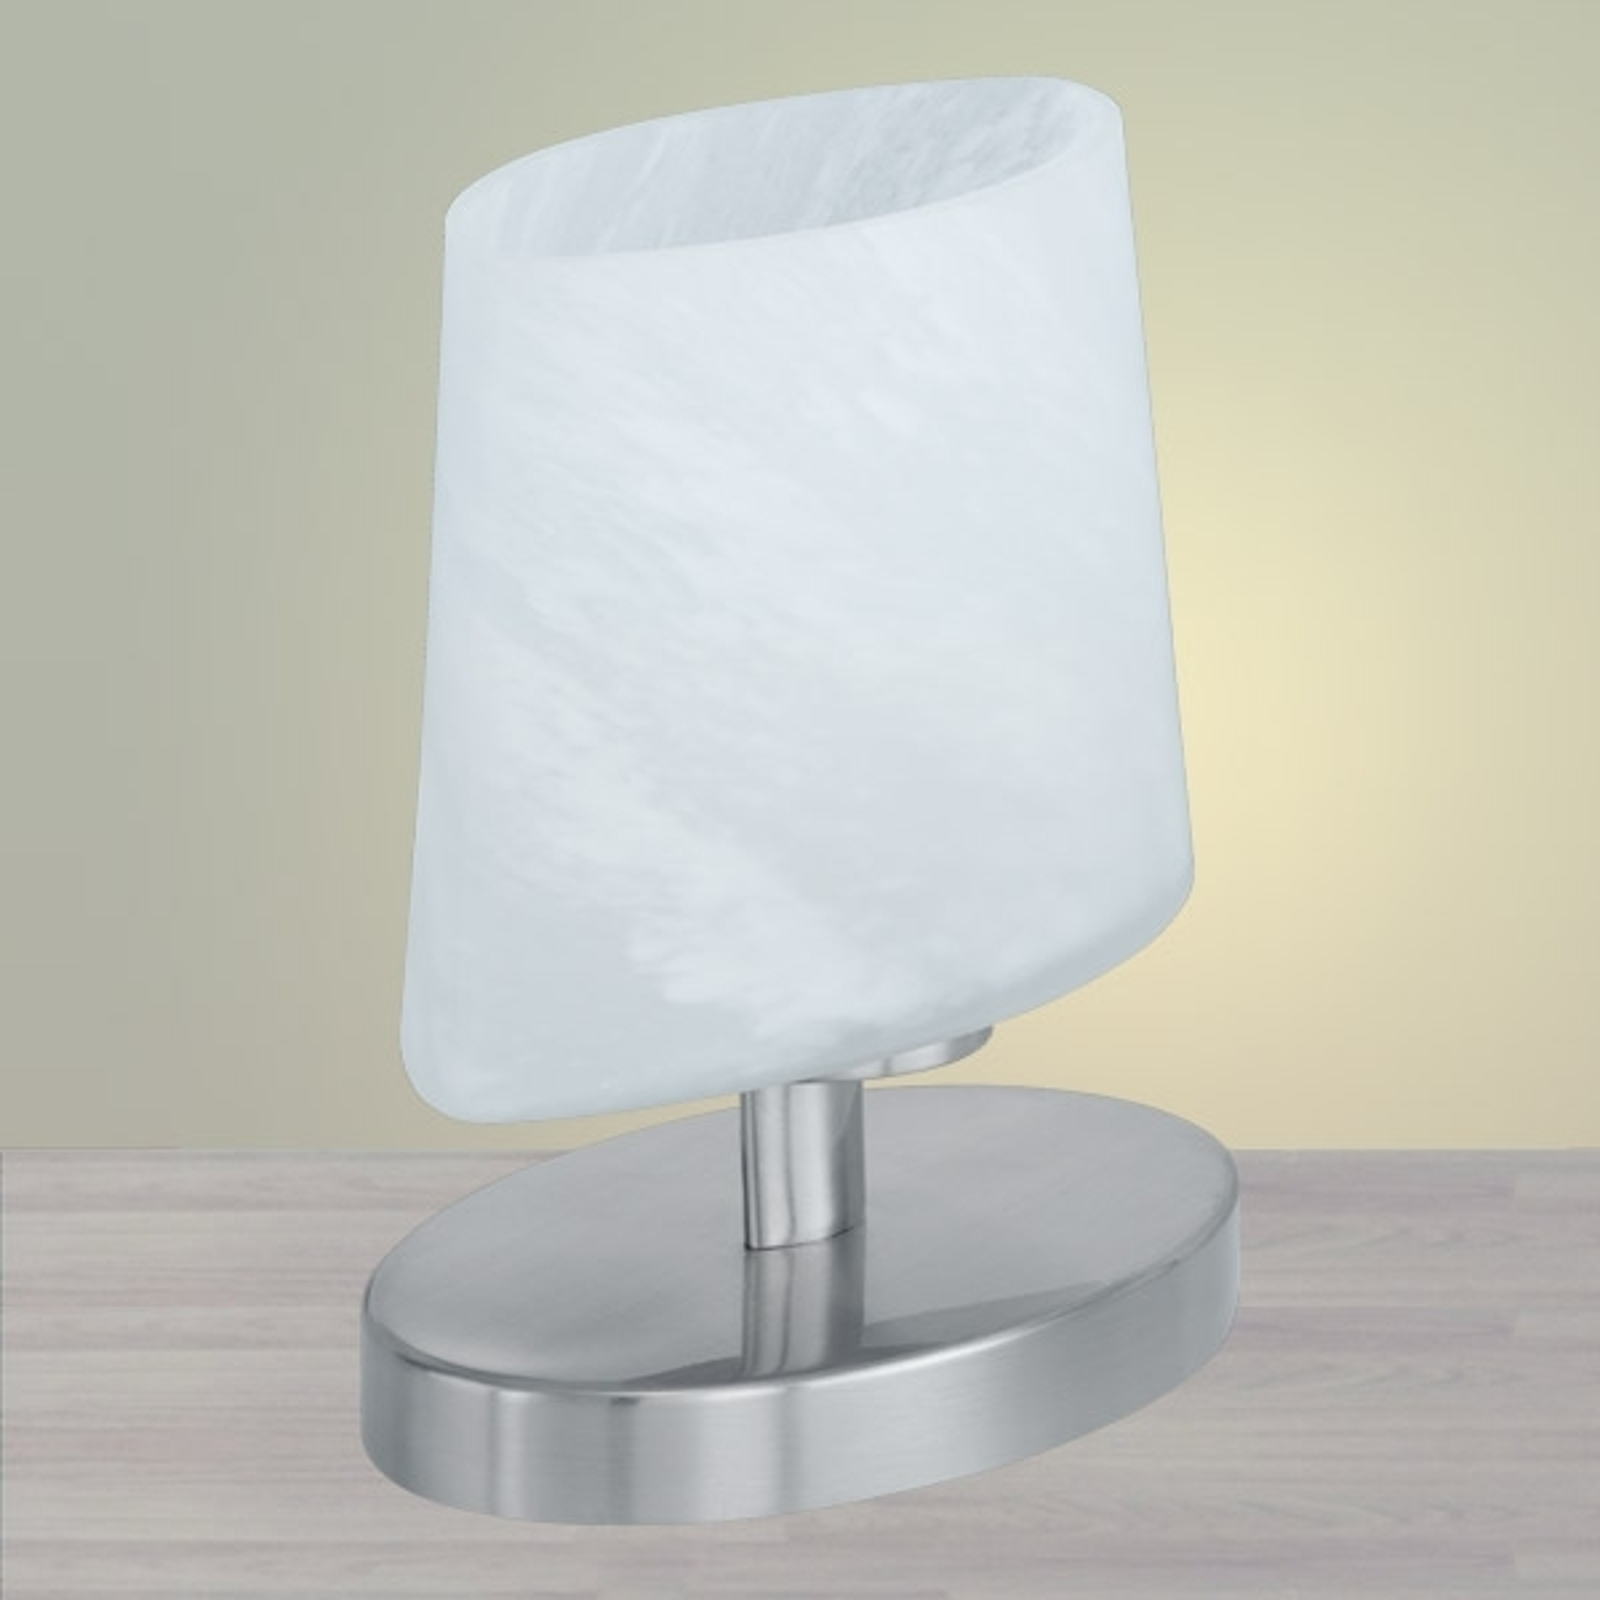 Kleine ovale tafellamp met glazen kap